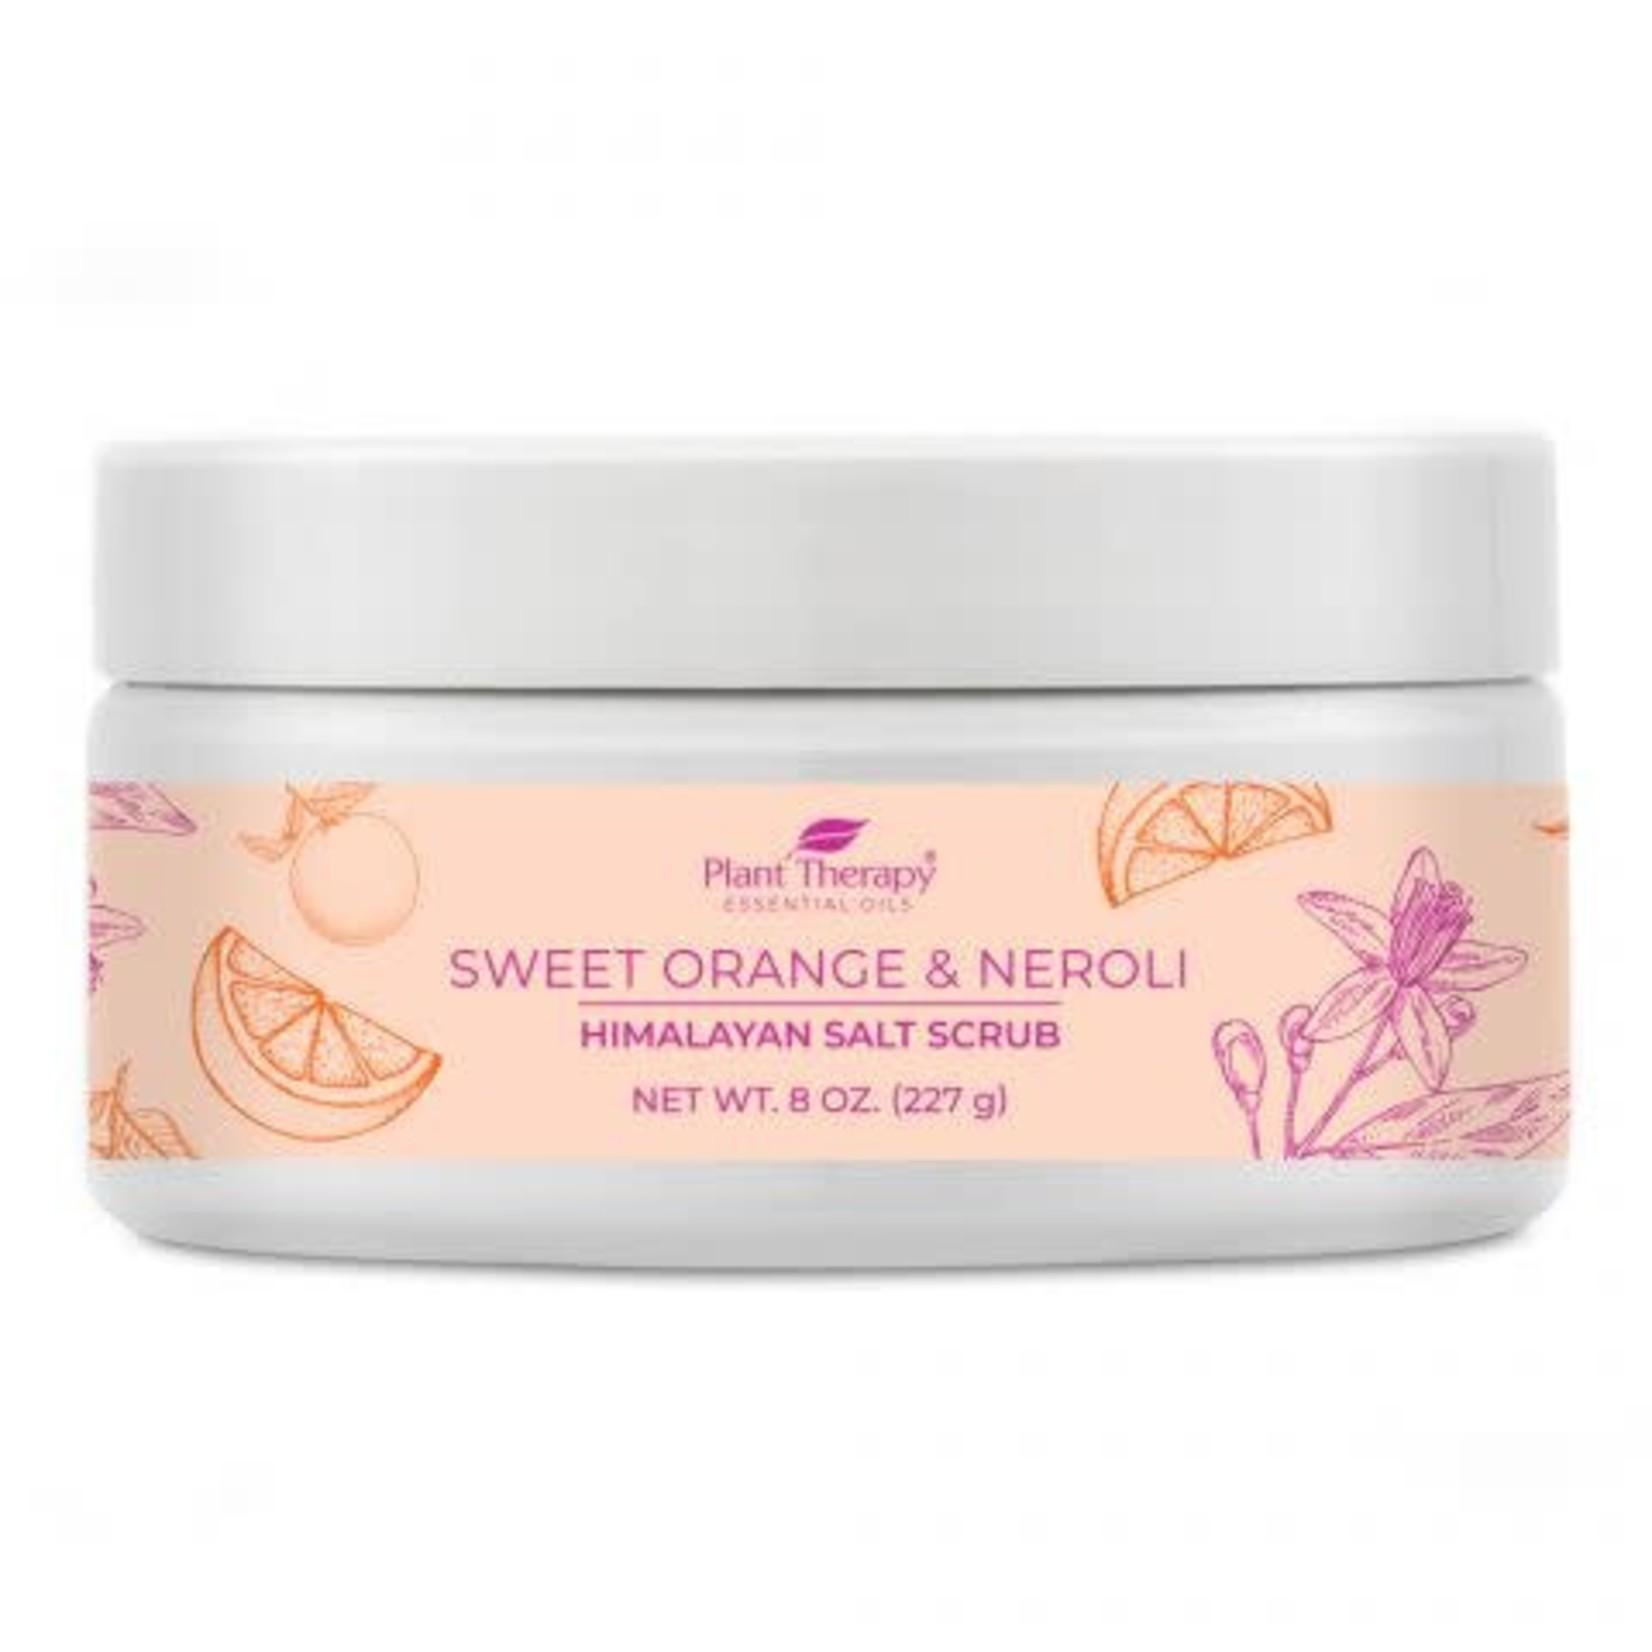 Plant Therapy PT Sweet Orange & Neroli Himalayan Salt Scrub 8oz